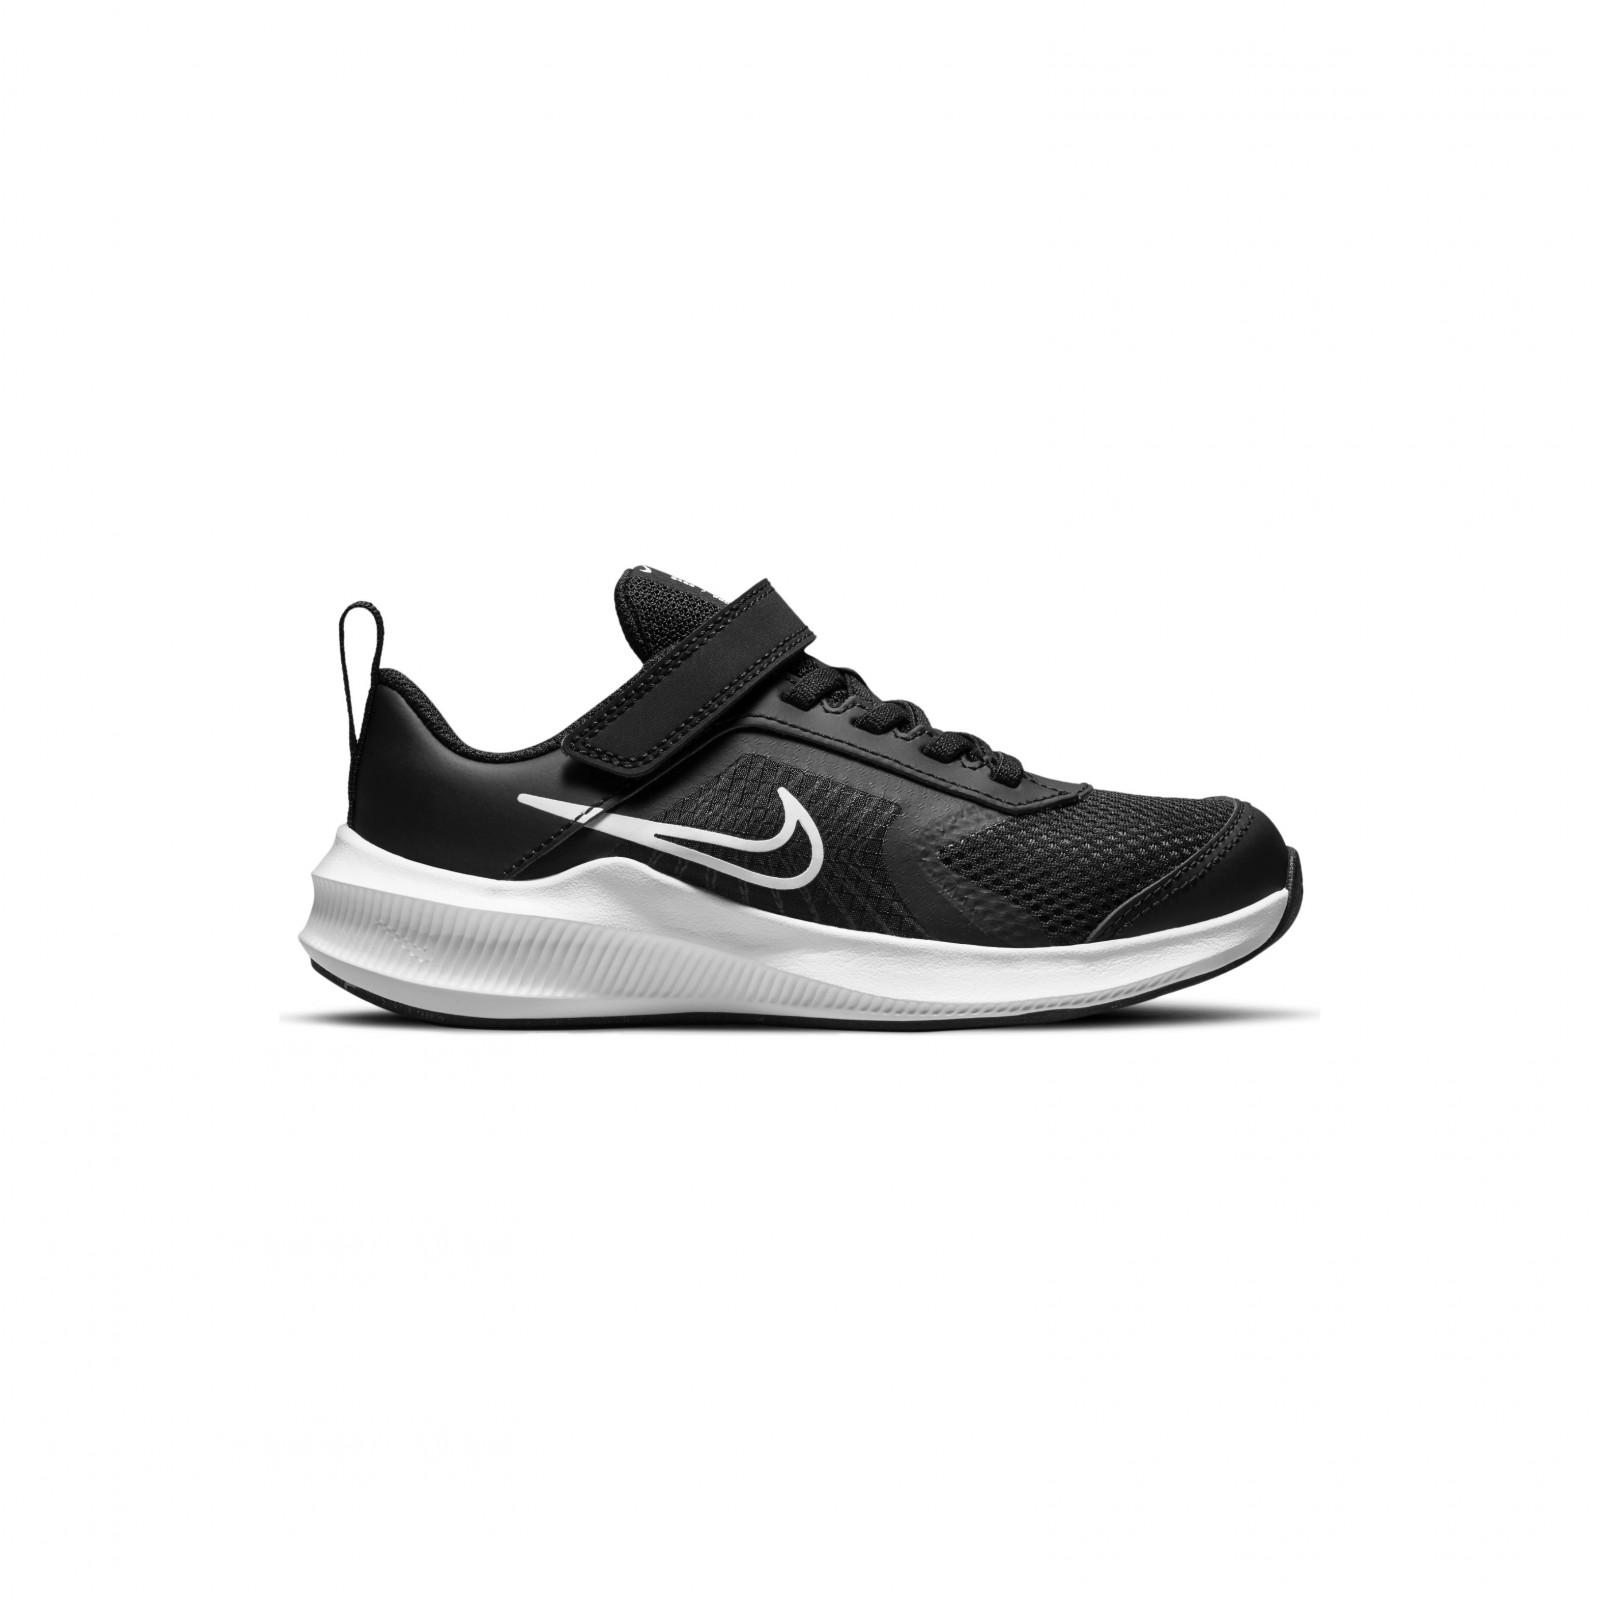 Nike Downshifter 11 BLACK/WHITE